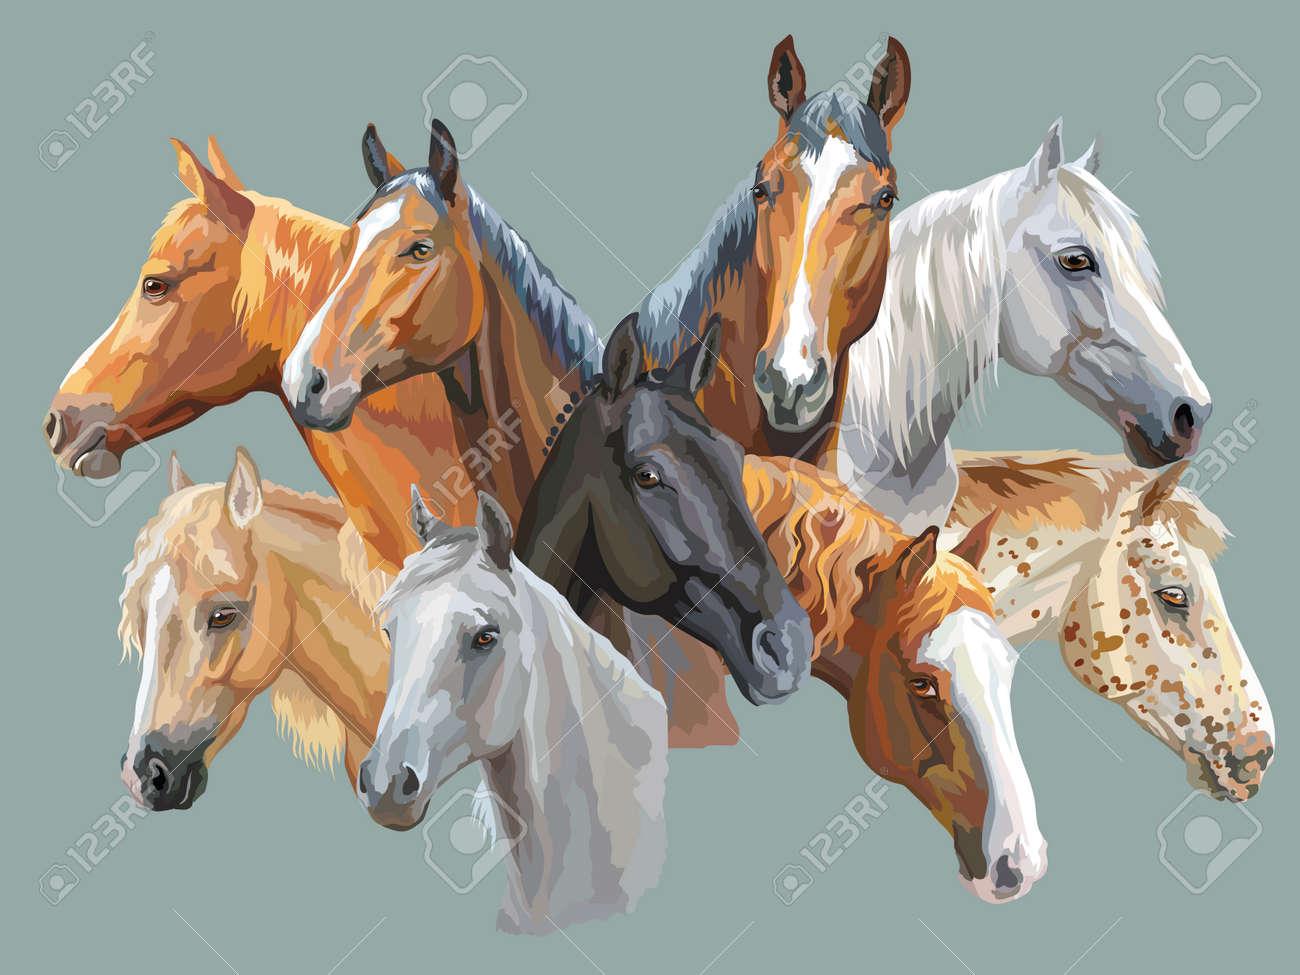 Set of colorful vector portraits of horses breeds (Trakehner horse, Welsh Pony, Orlov Trotter, Arabian horse, Appaloosa horse) isolated on grey background - 97459821